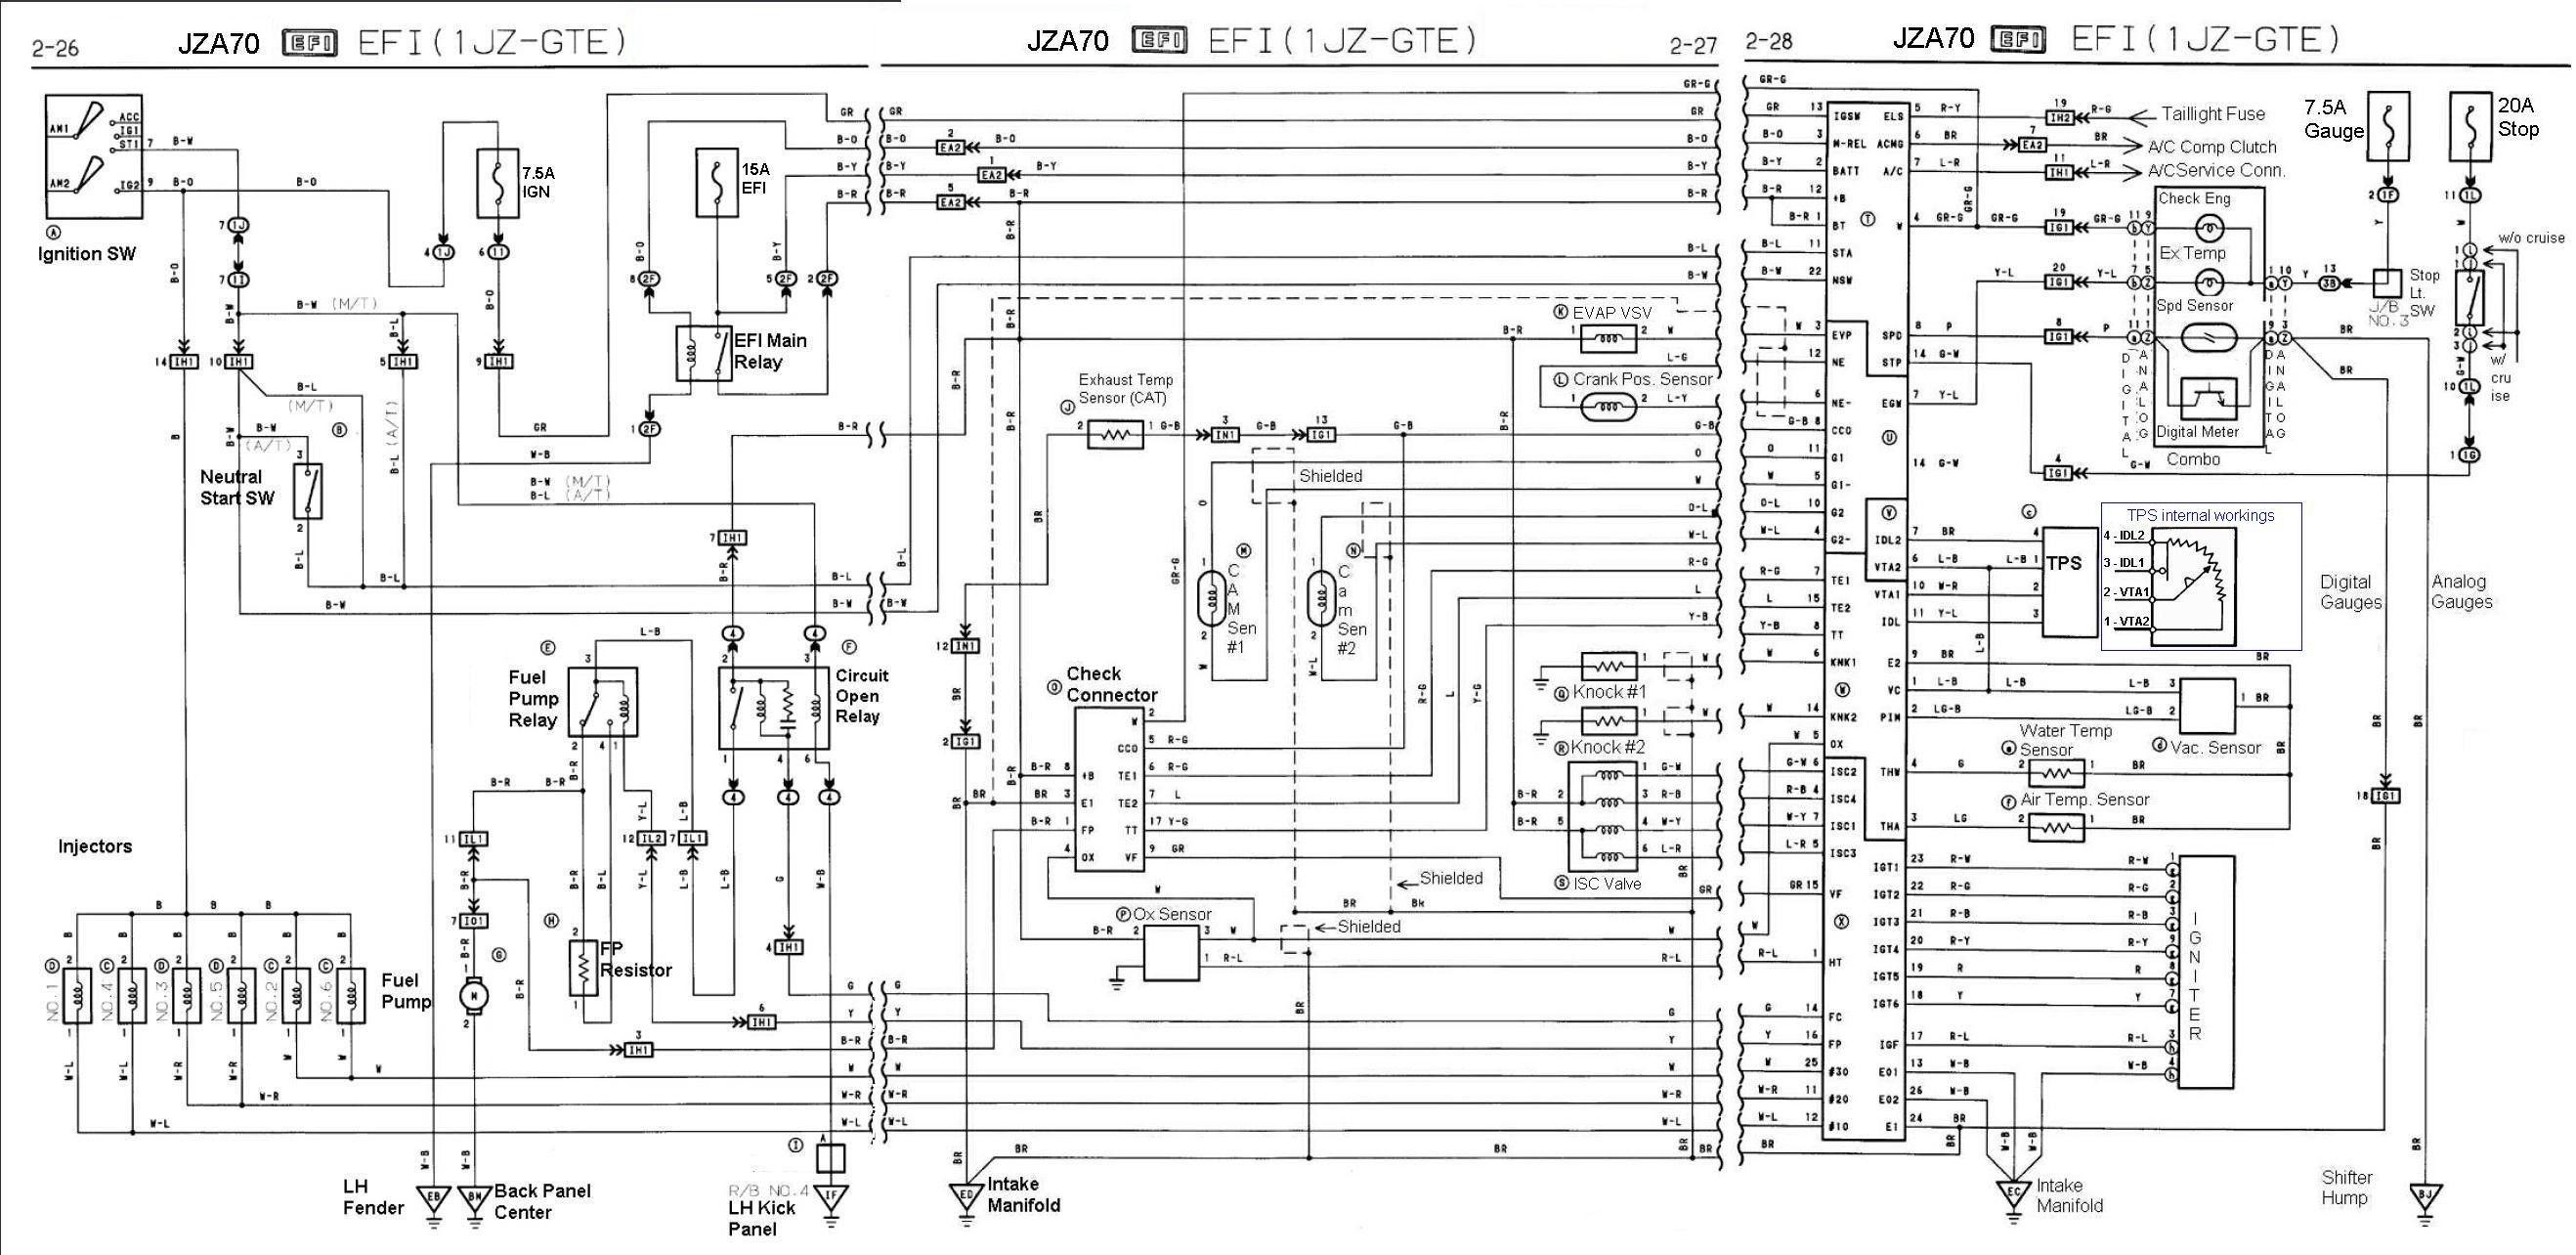 New Bmw E46 318i Wiring Diagram Pdf Diagram Diagramtemplate Diagramsample Bmw E46 Electrical Diagram Electrical Wiring Diagram